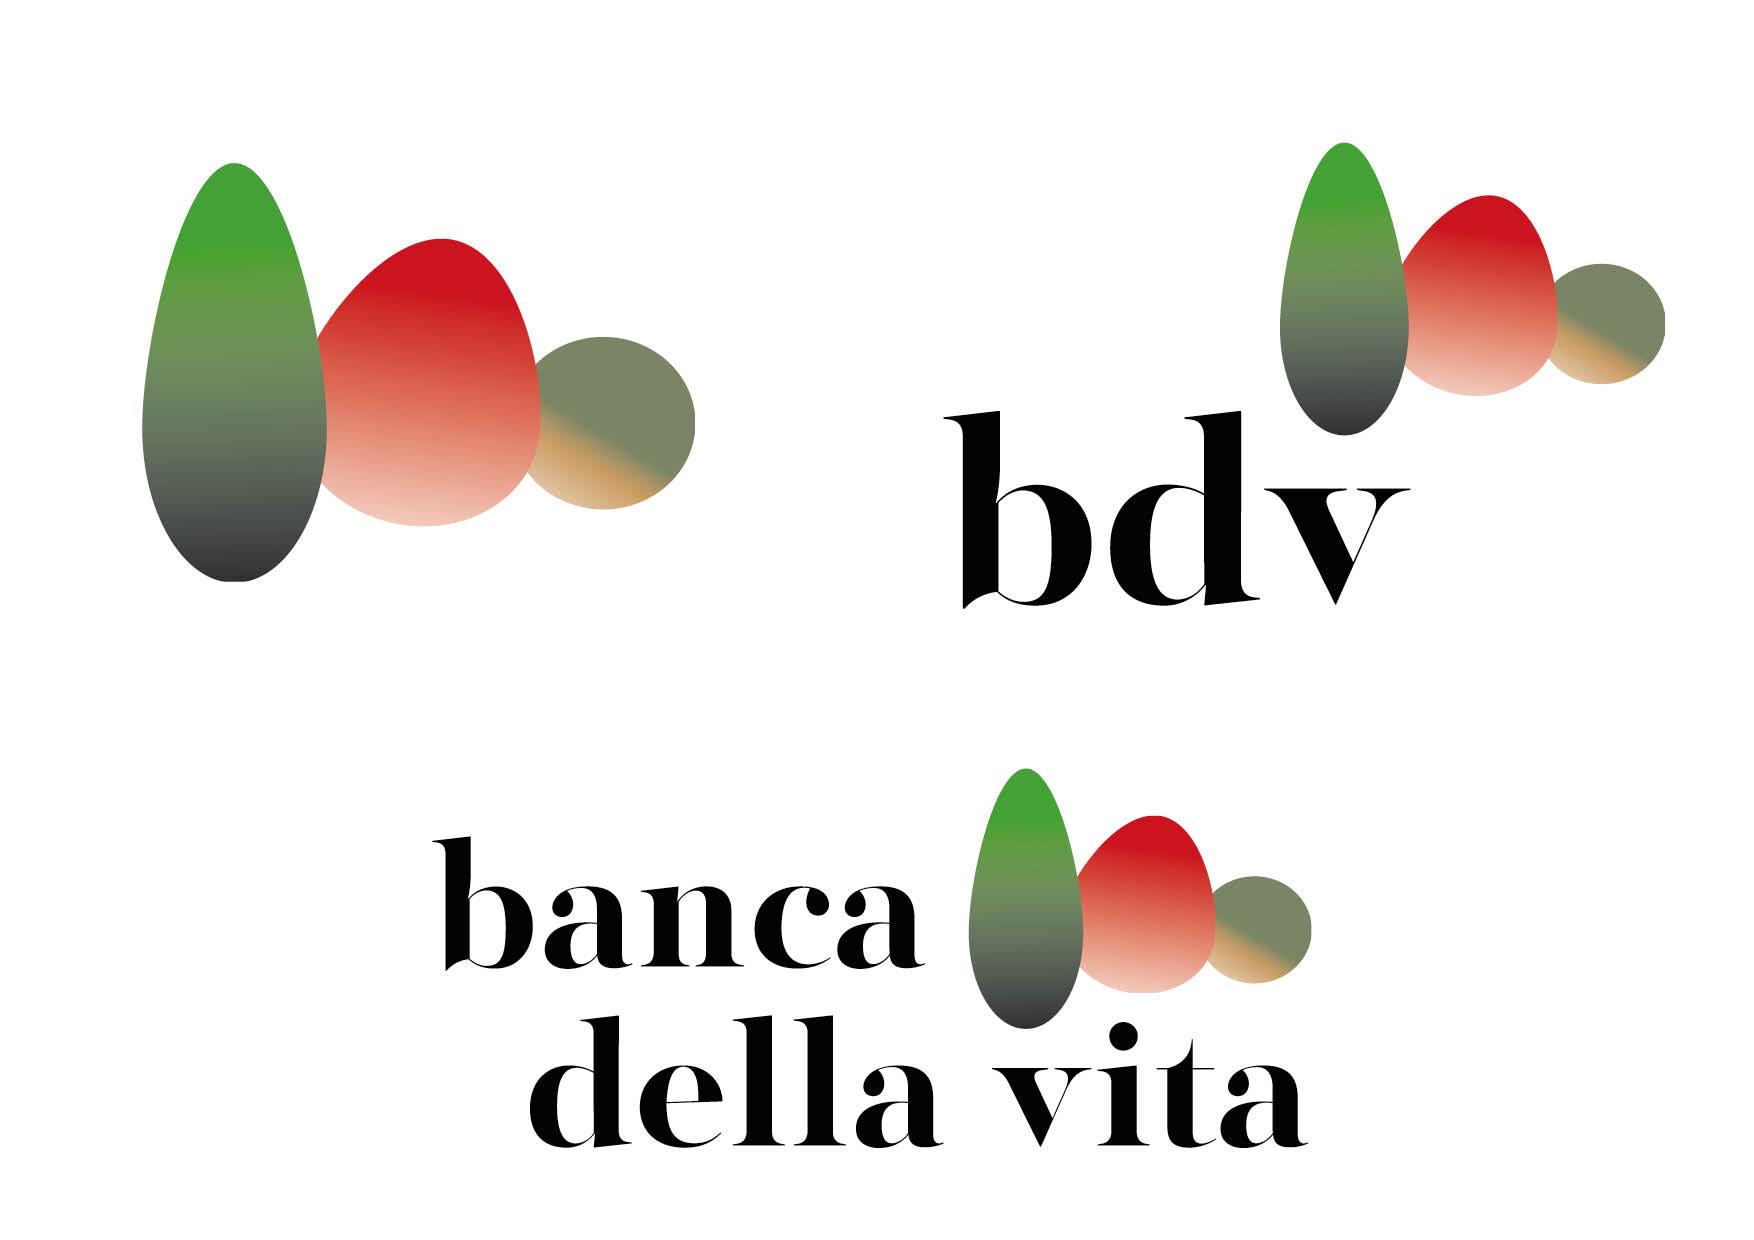 Life bank BDV